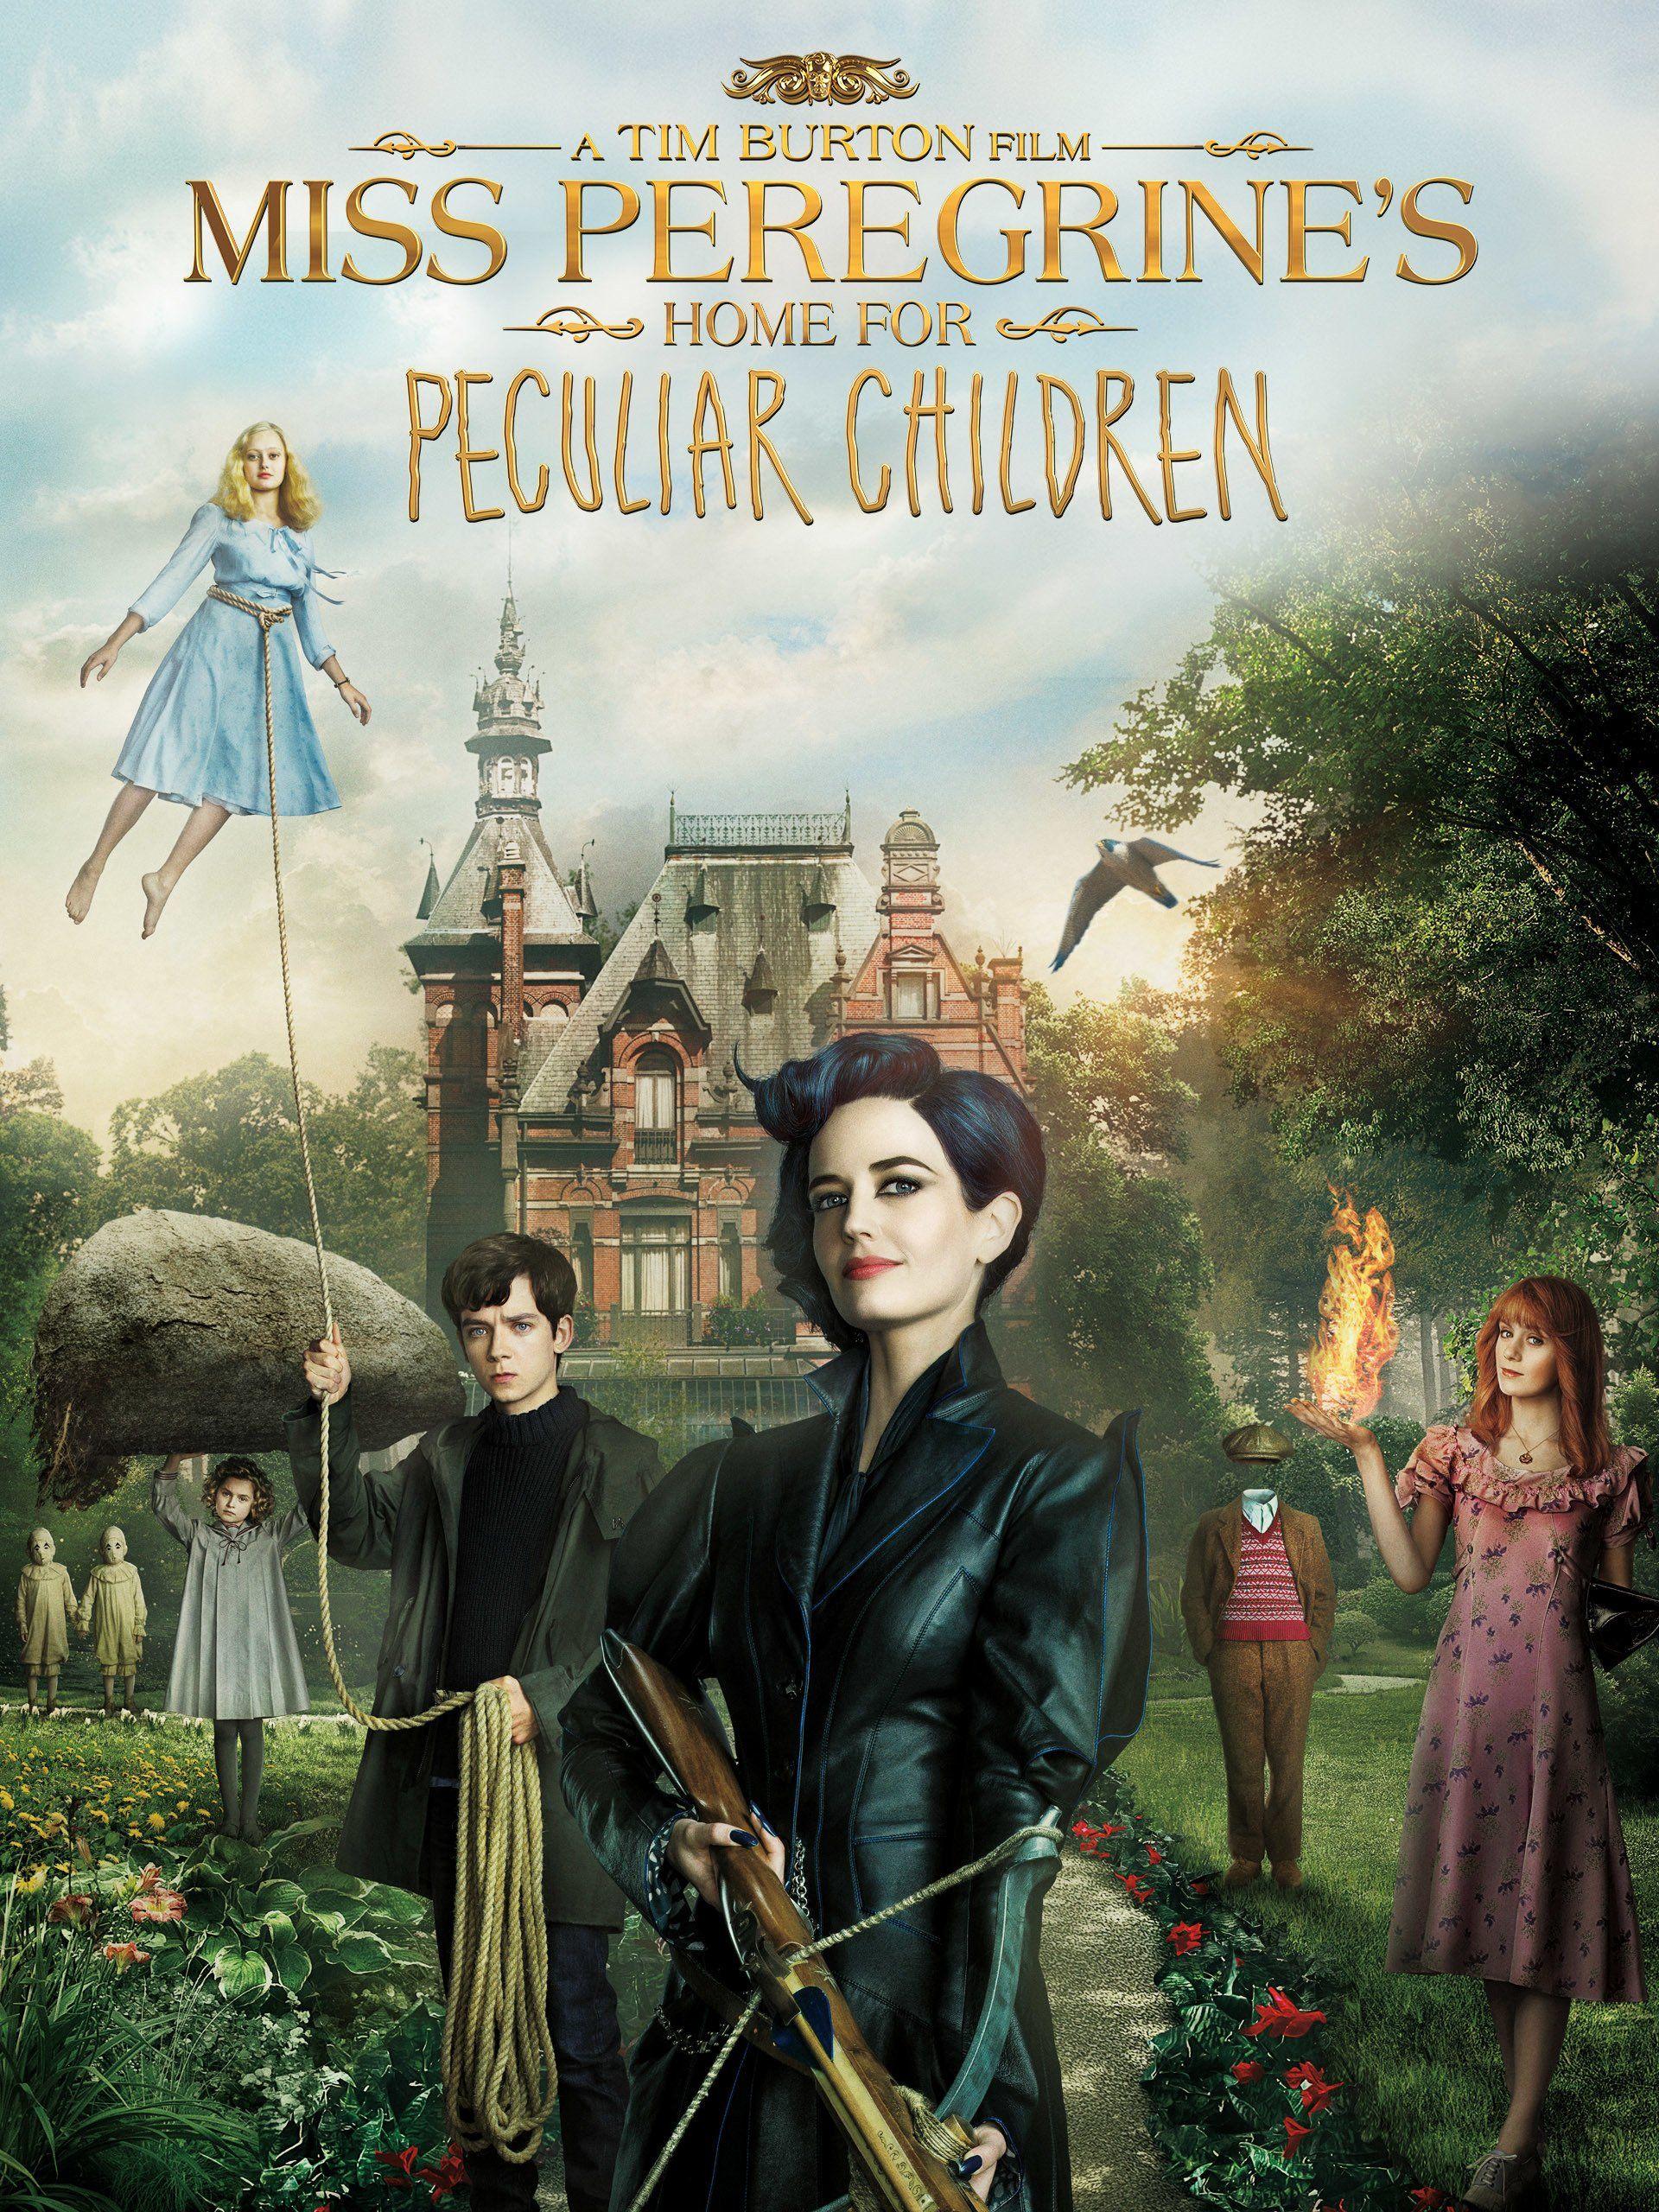 Miss Peregrines Home For Peculia Peculiar Children Movie Miss Peregrine S Peculiar Children Home For Peculiar Children